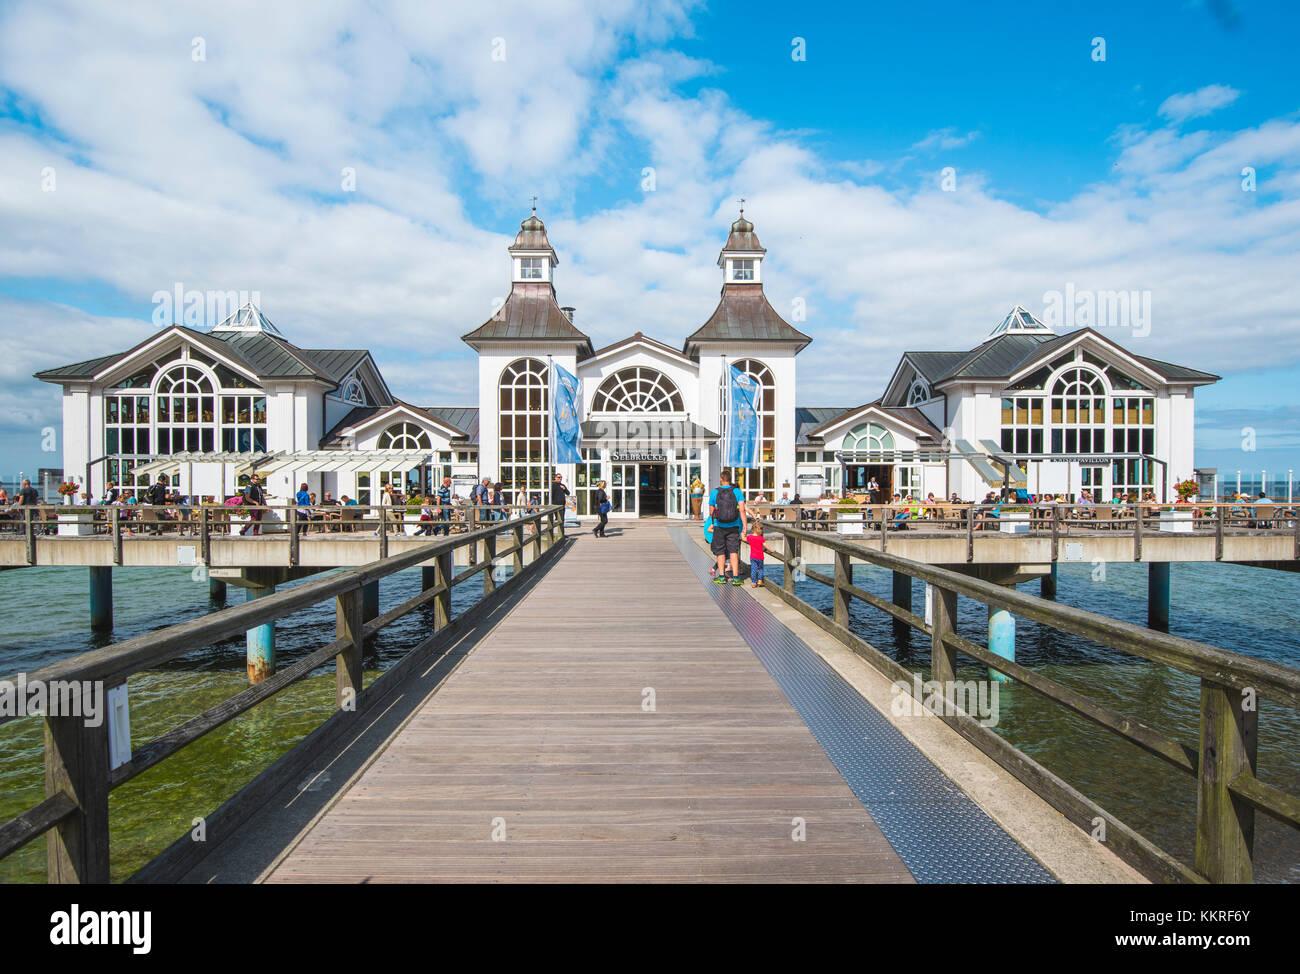 Rugen island sellin stock photos rugen island sellin for Villa sellin rugen